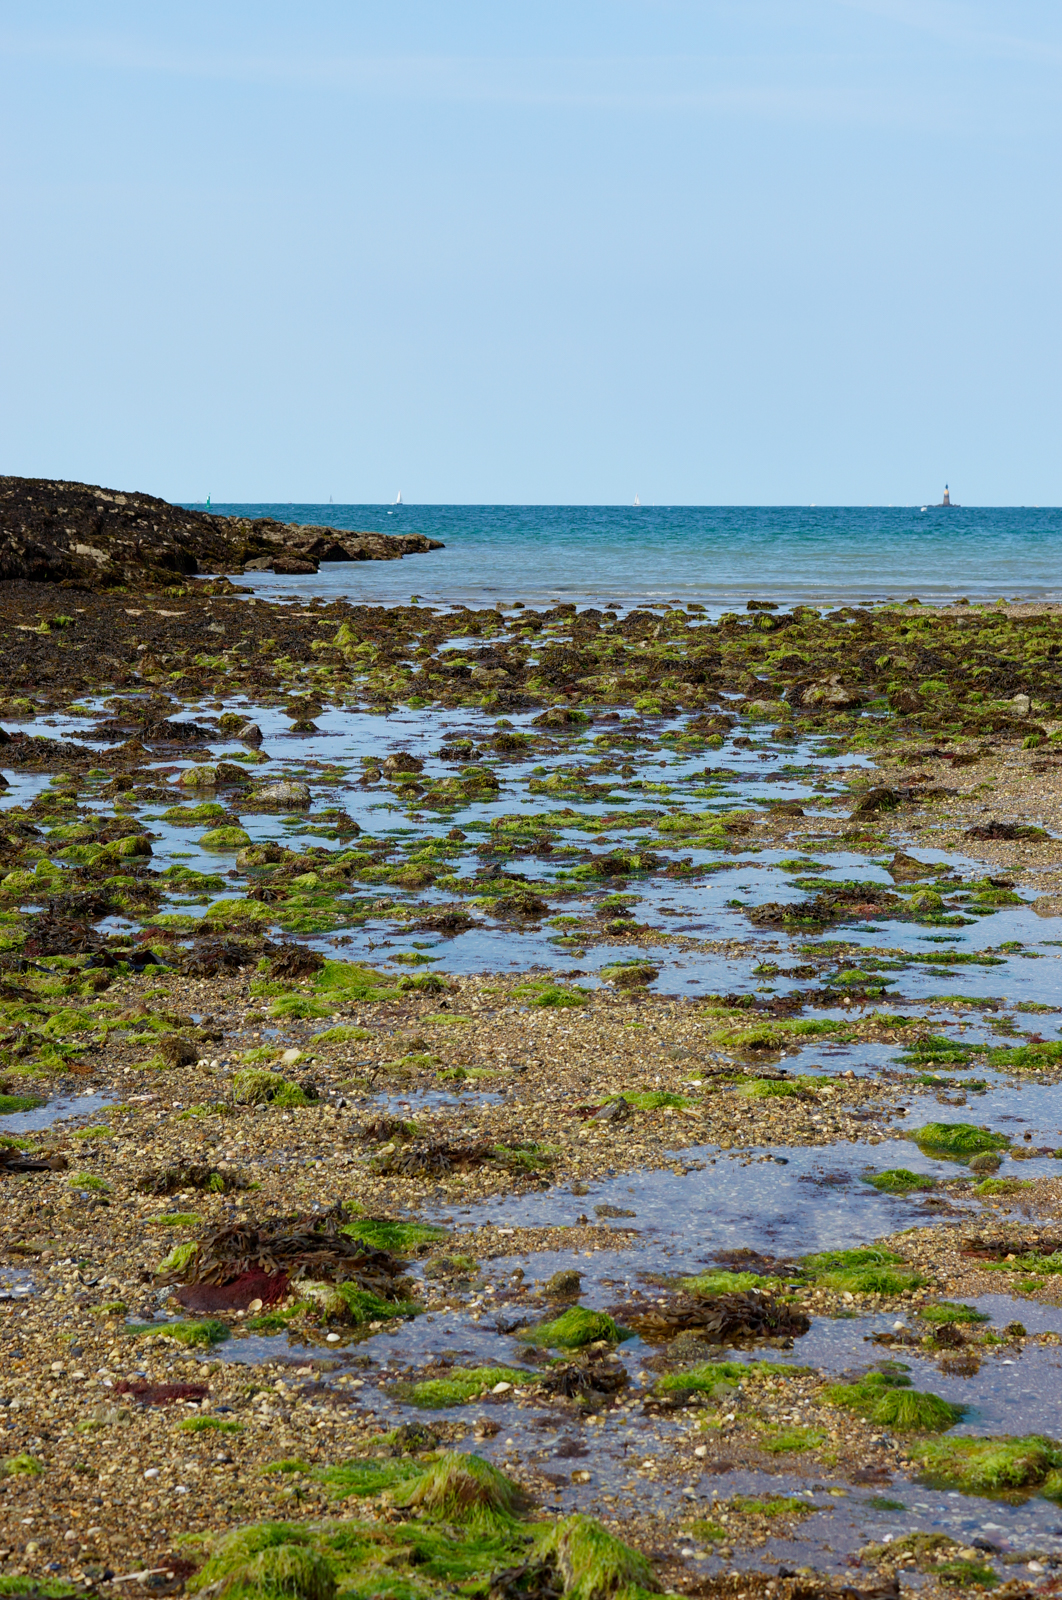 saint-malo, tourisme bretagne, visiter bretagne, visiter saint-malo, idée balade saint-malo, plage bretagne